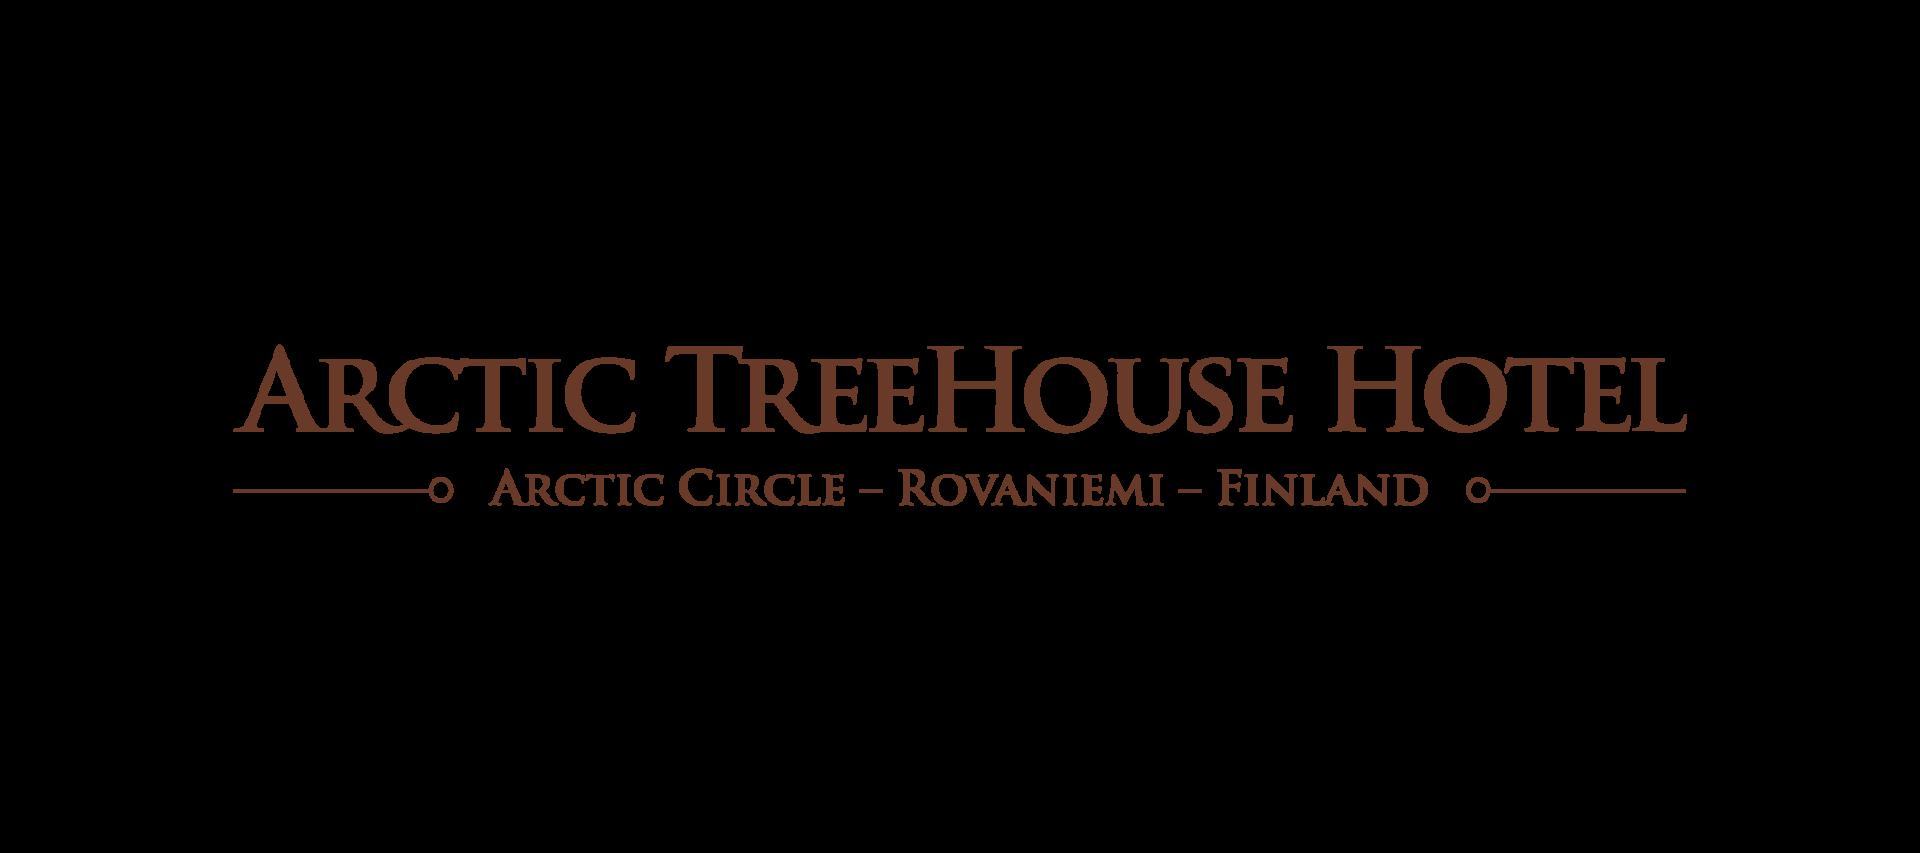 Arctic TreeHouse Hote logo